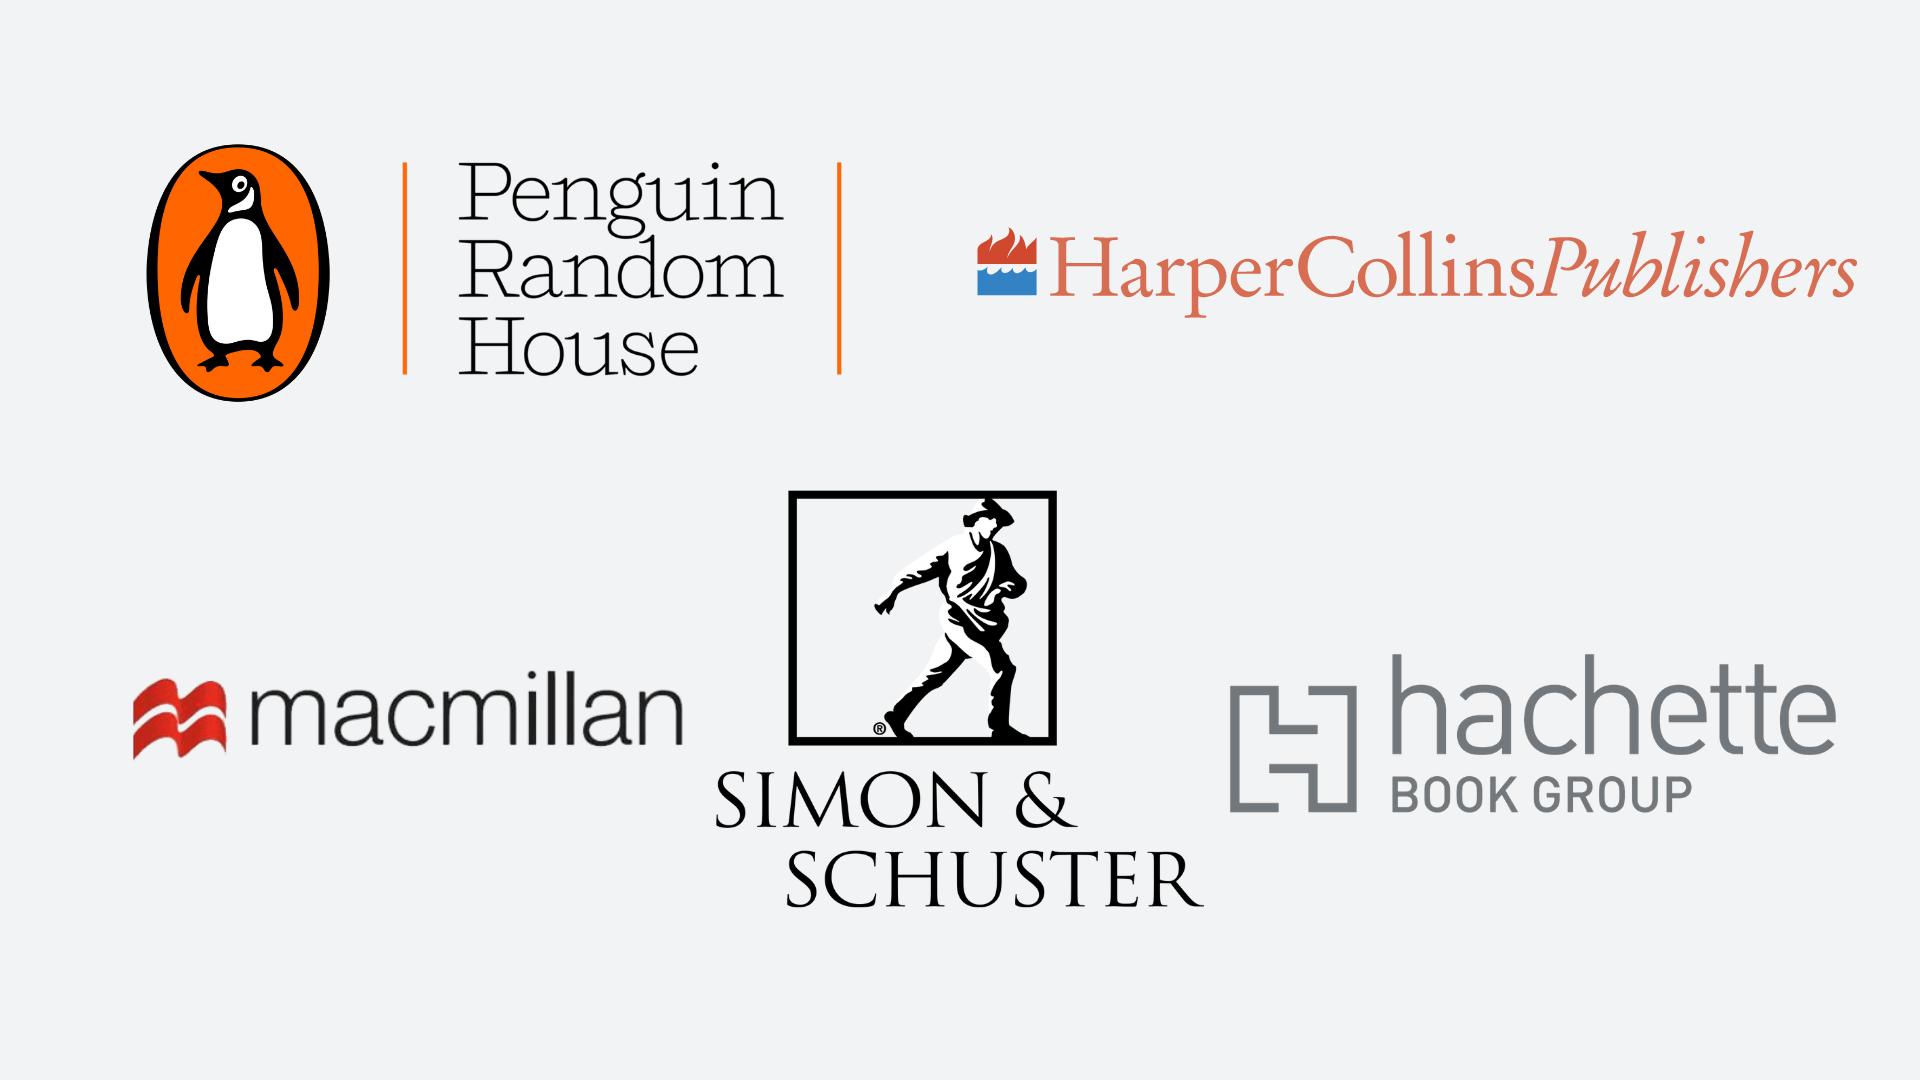 The Big Five Publishers